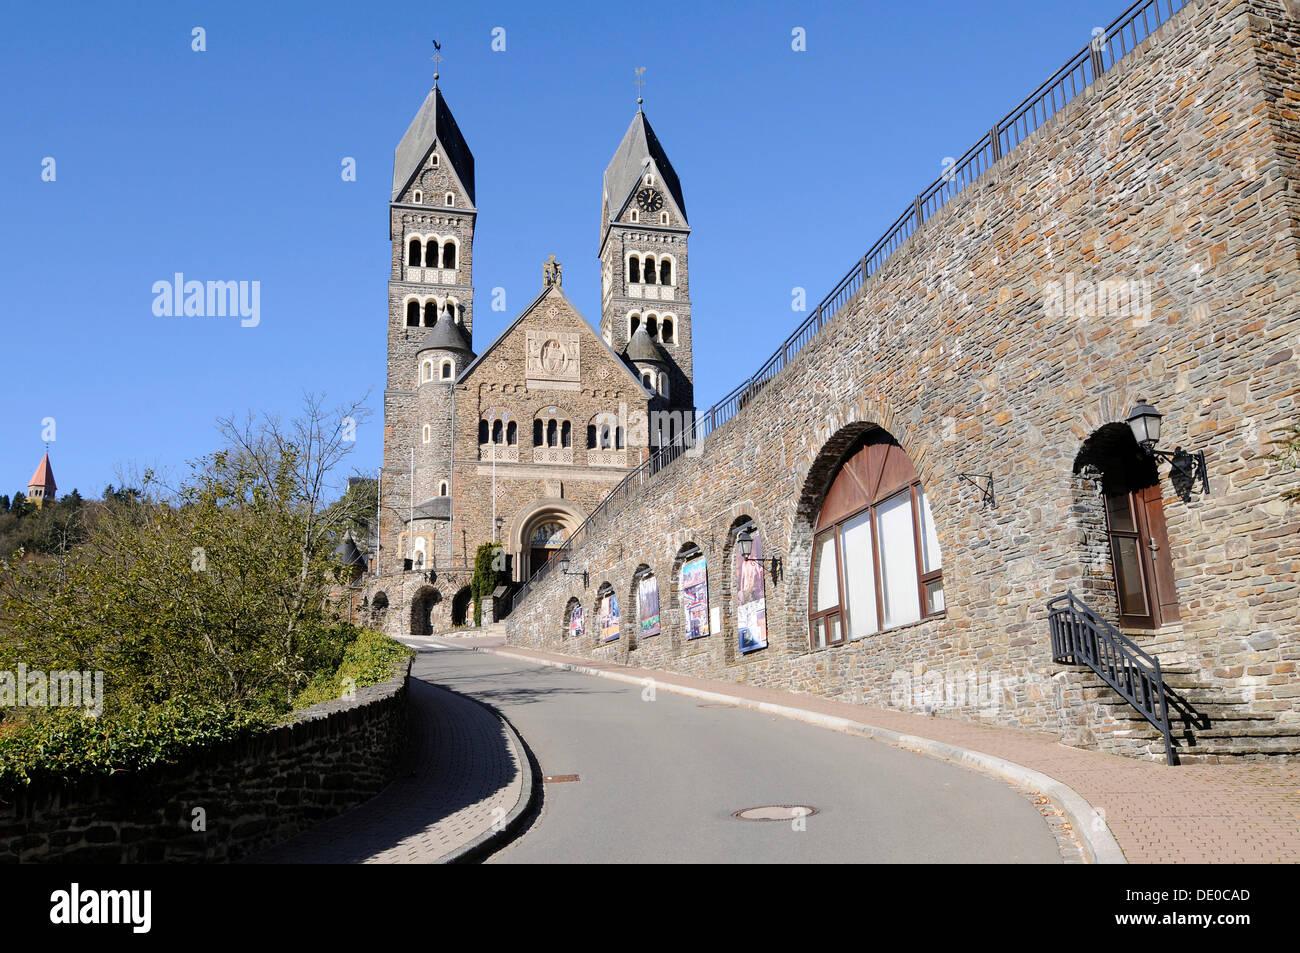 Parish Church, Clervaux, Luxembourg, Europe, PublicGround - Stock Image